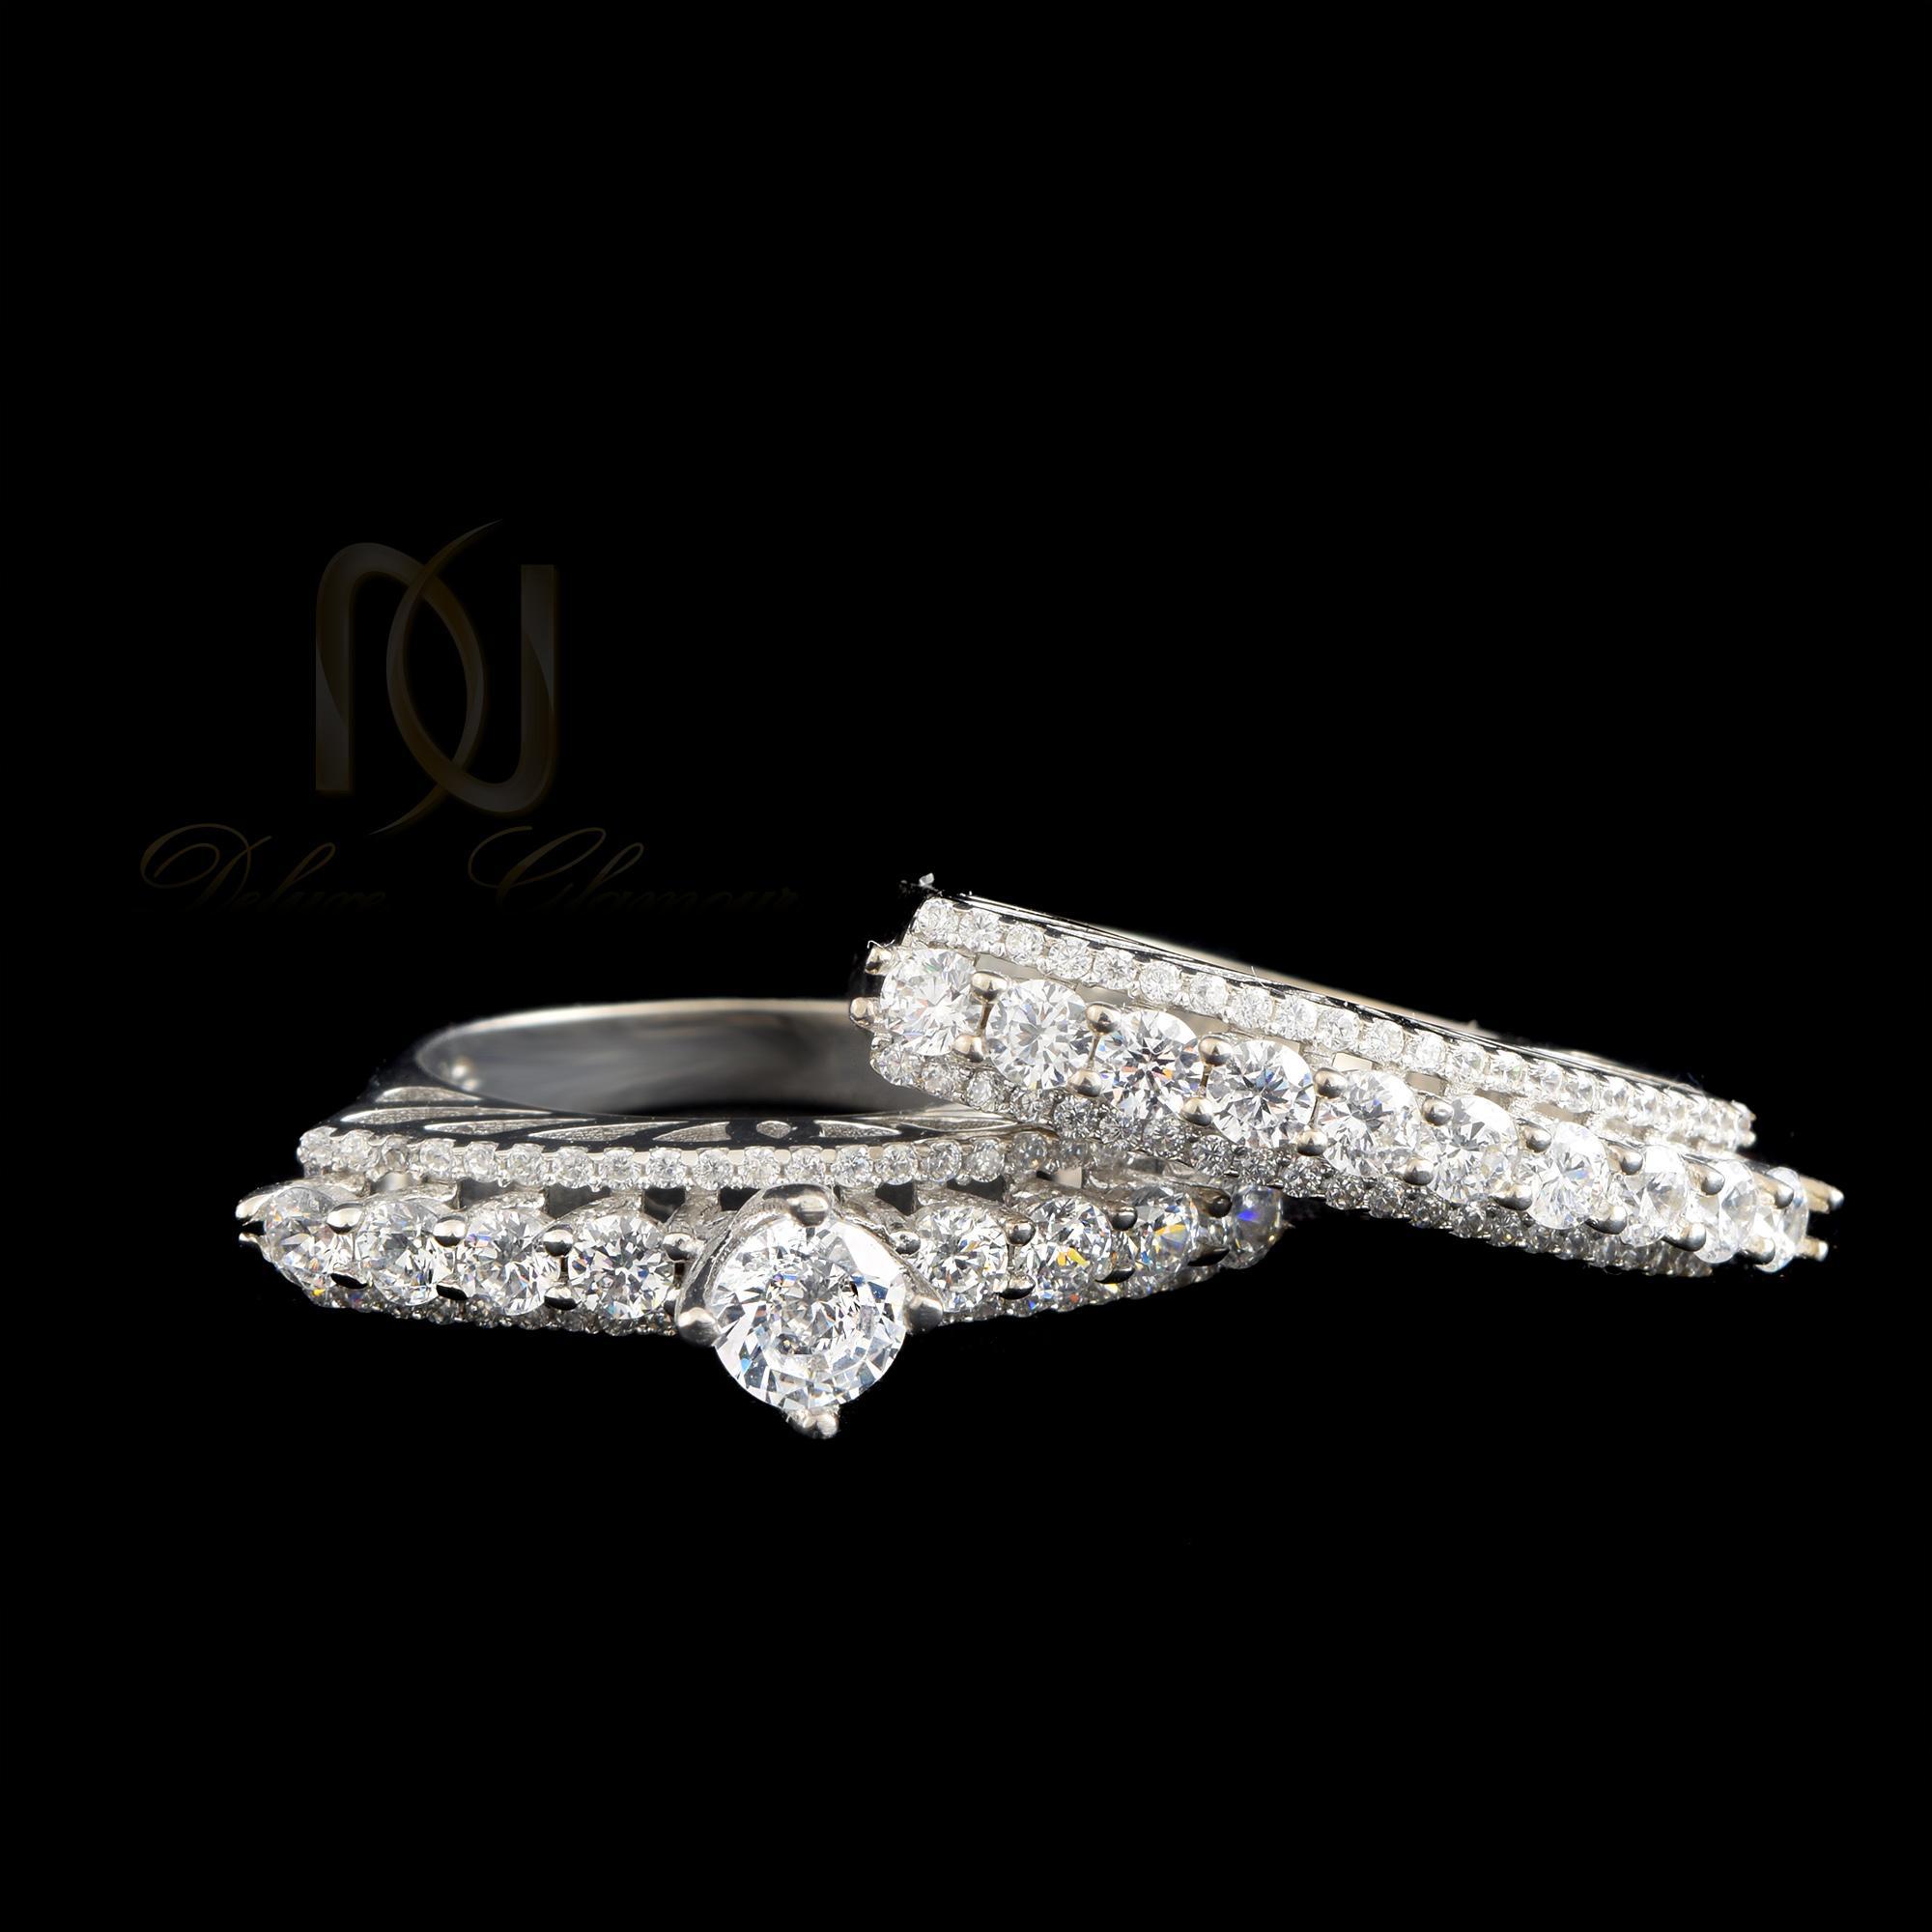 حلقه و پشت حلقه نقره دخترانه rg-n345